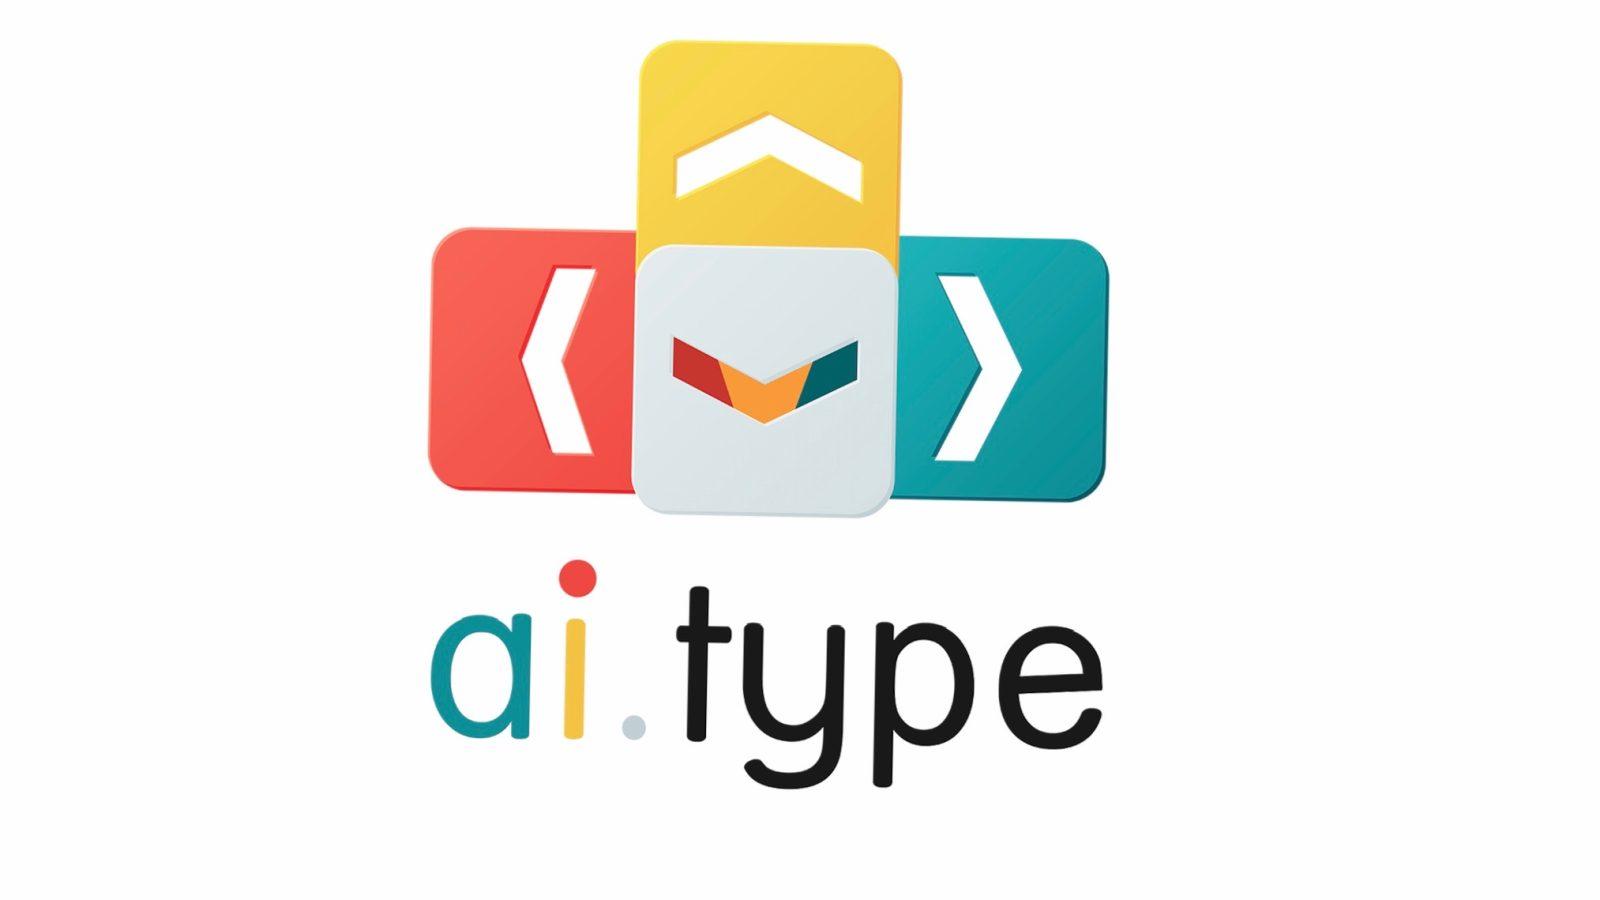 ai.type android klavye